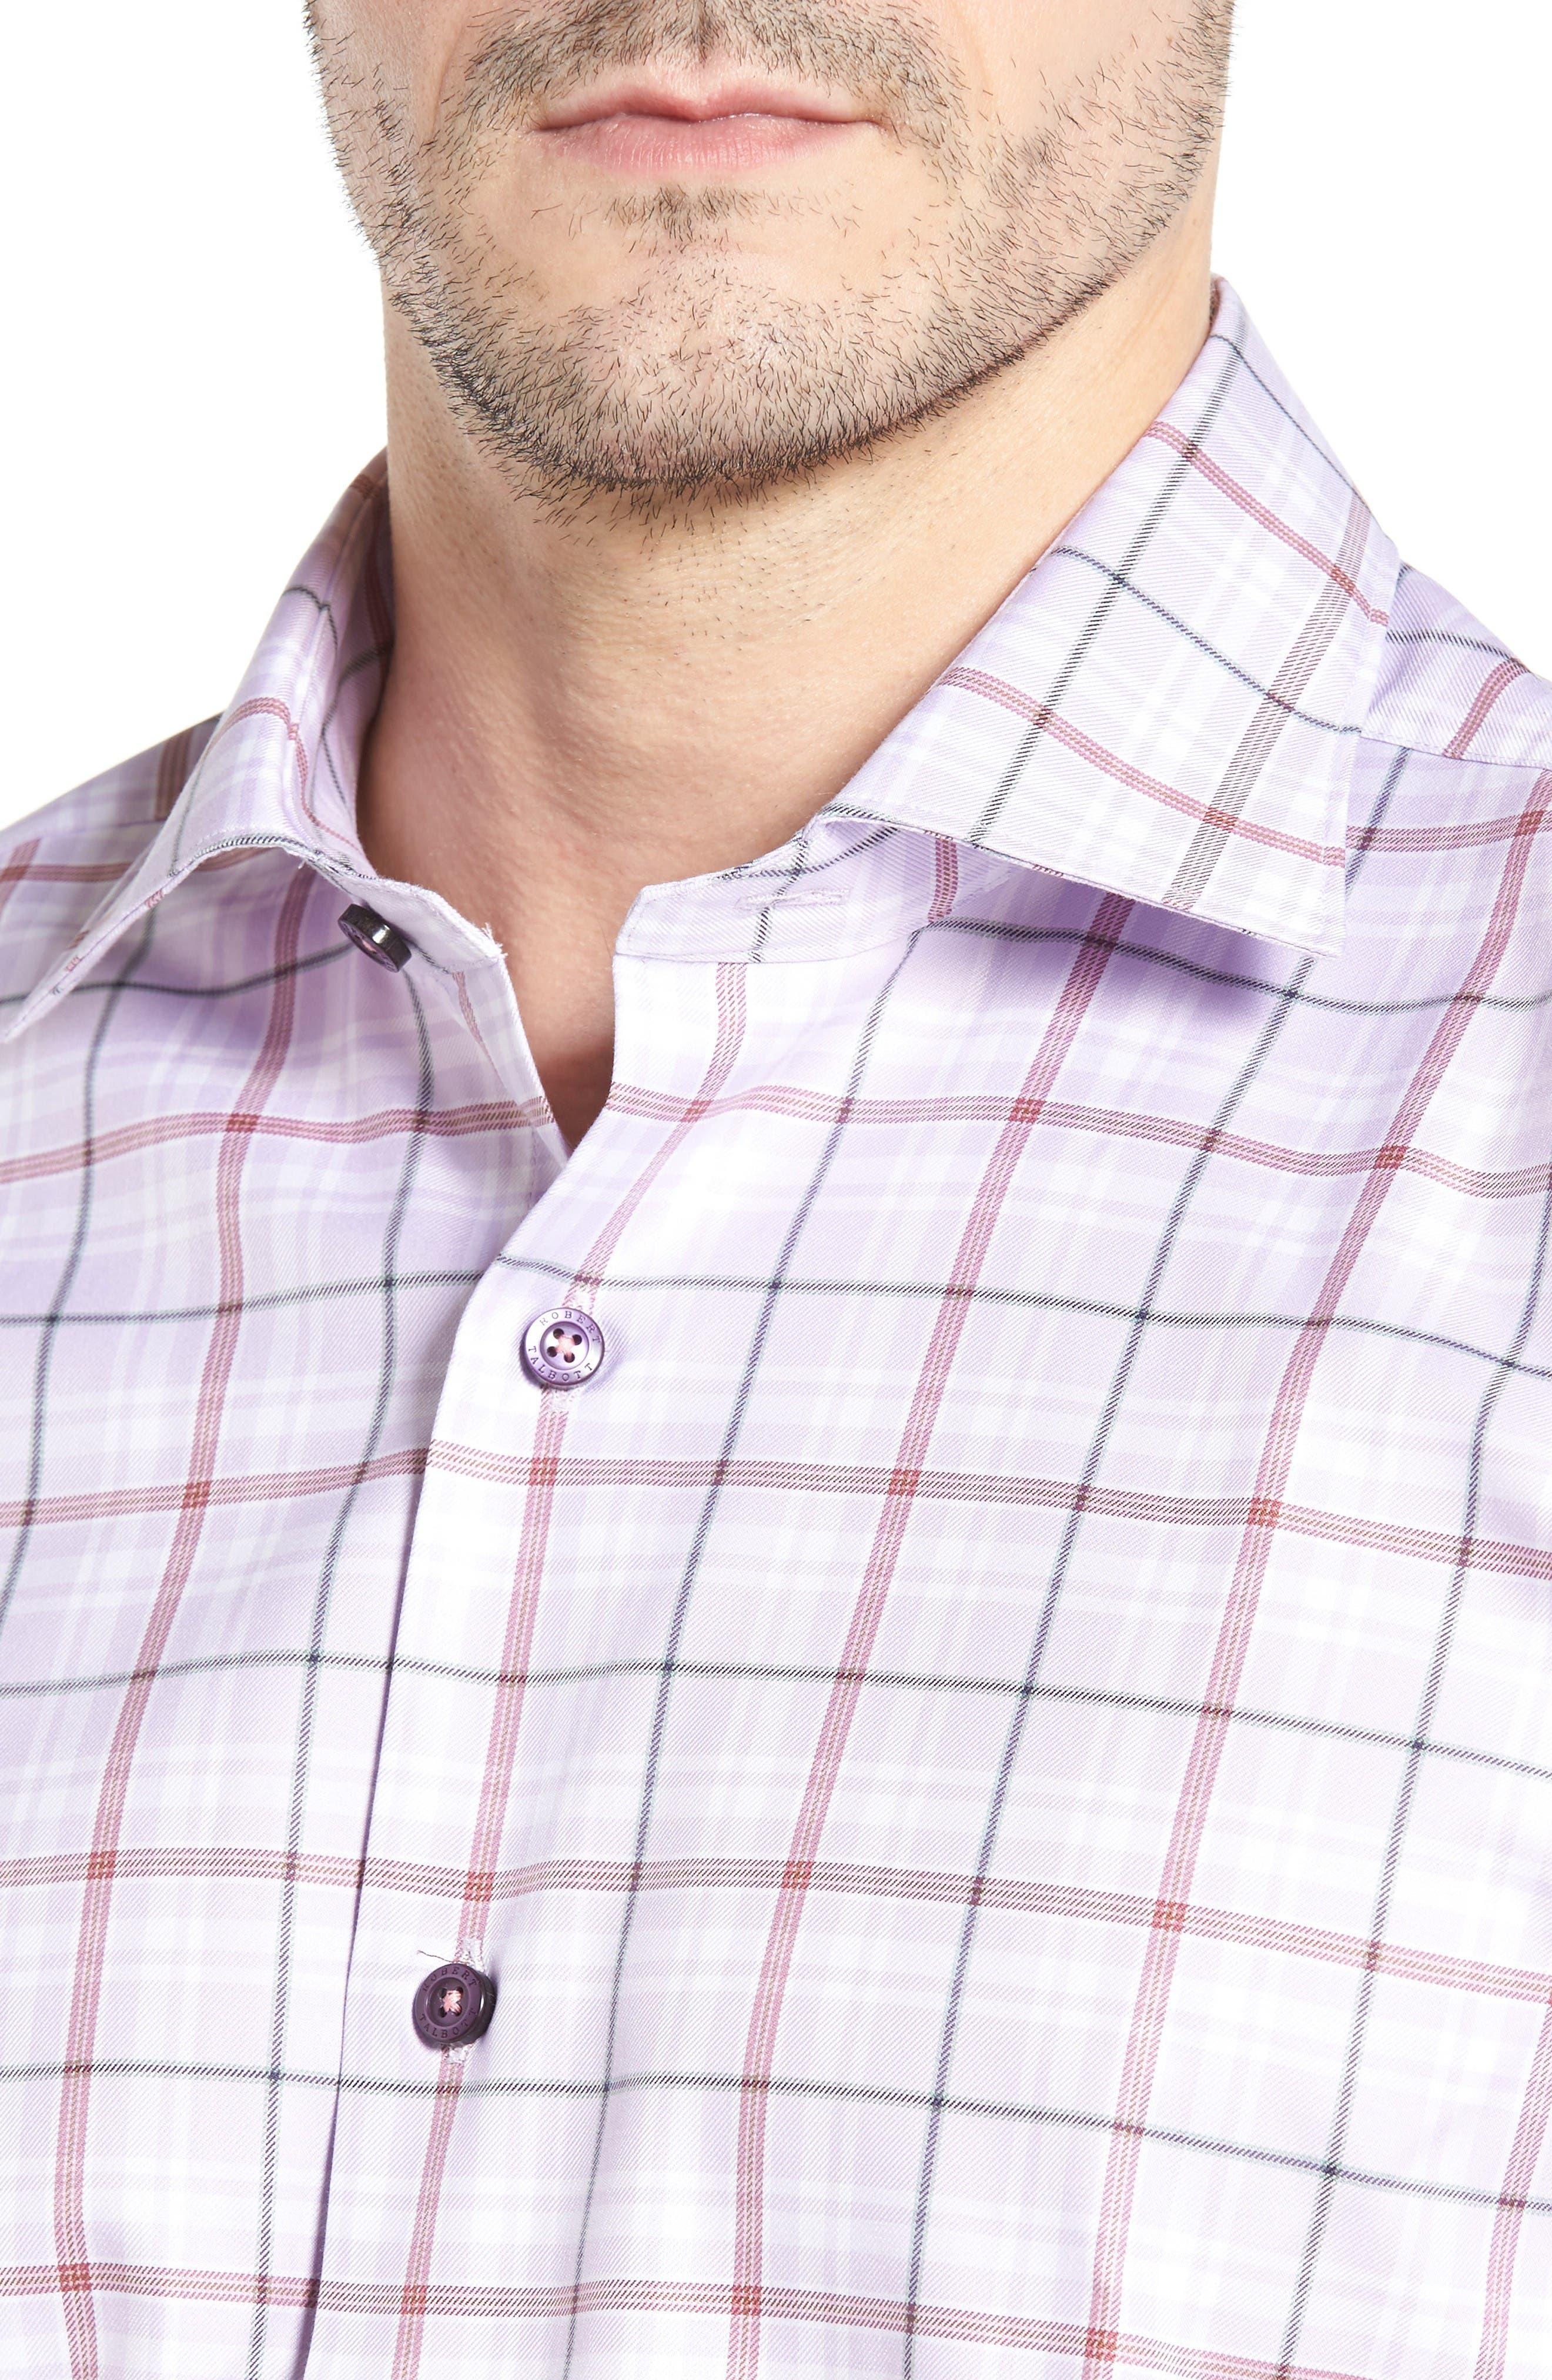 Crespi IV Tailored Fit Sport Shirt,                             Alternate thumbnail 4, color,                             Lavender